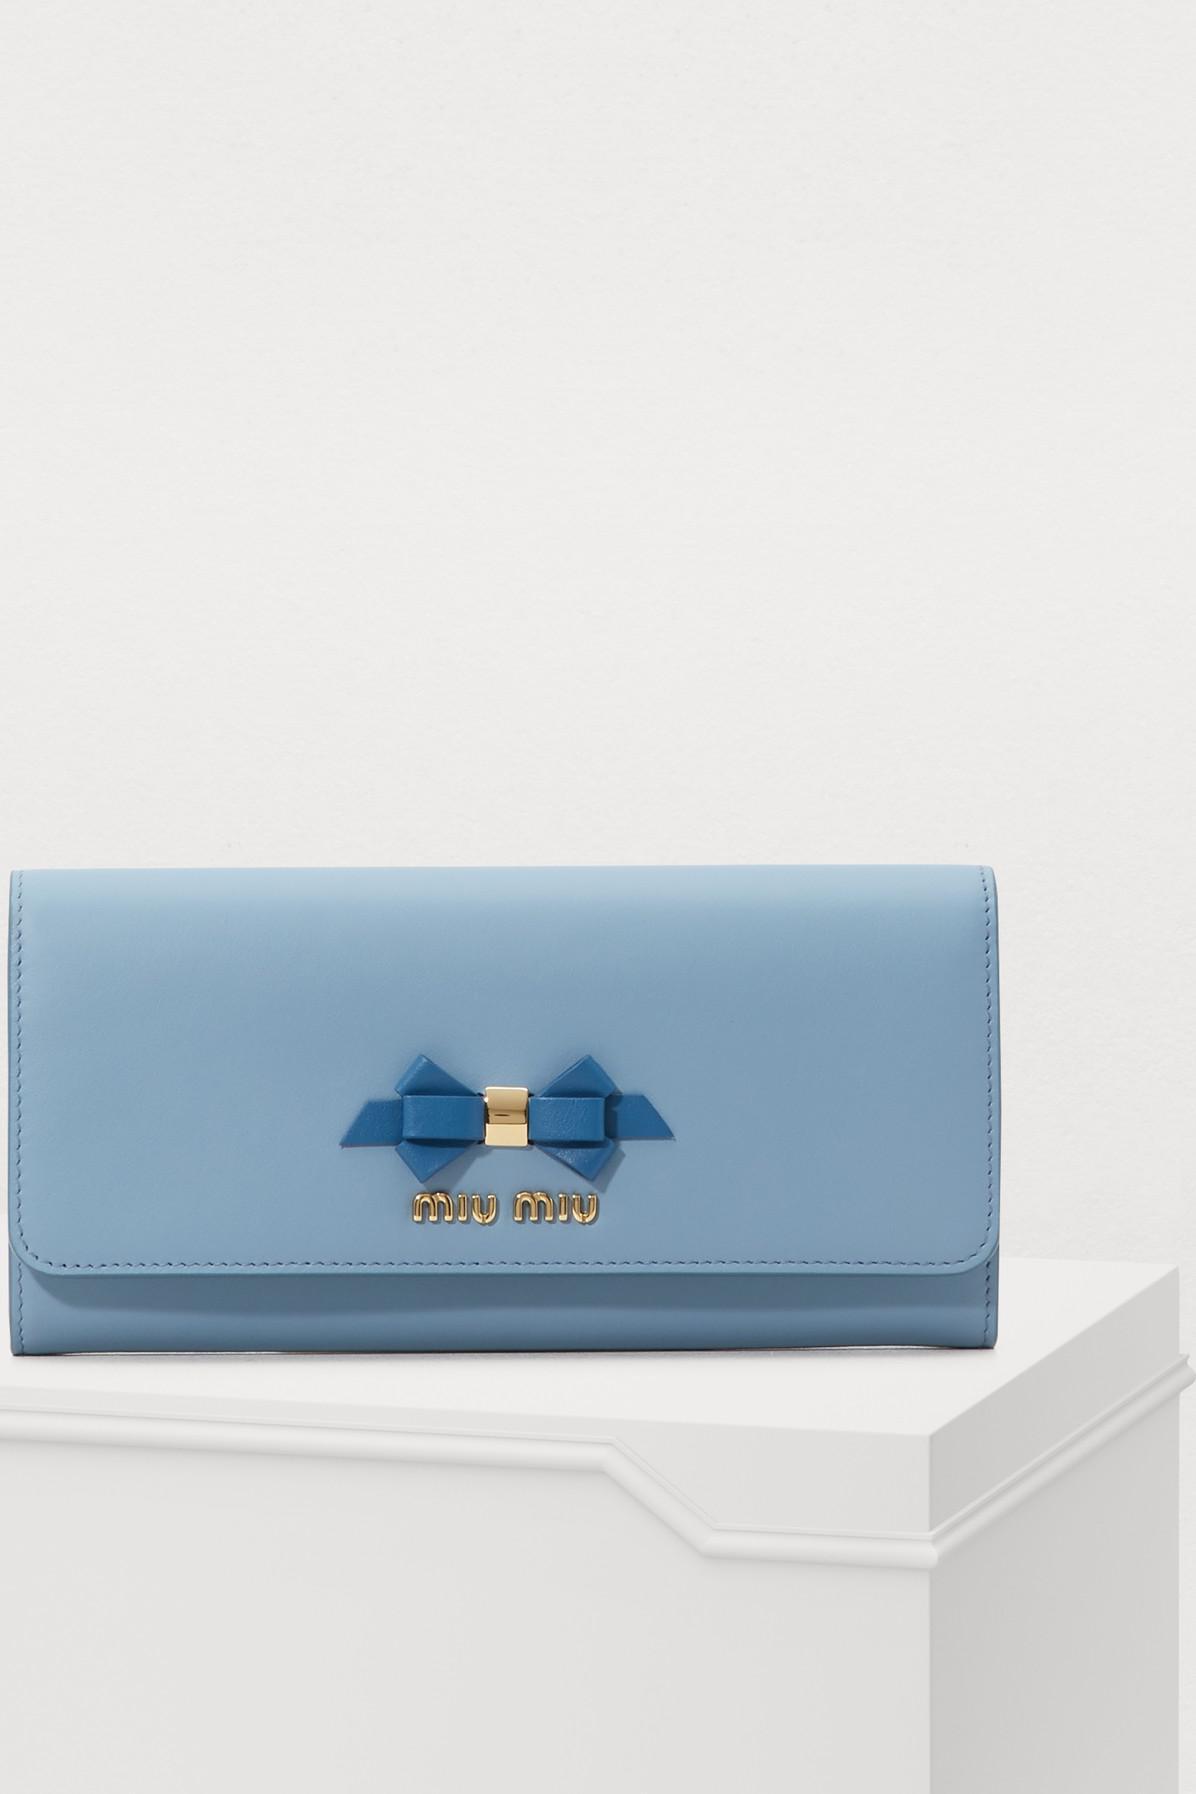 Lyst - Miu Miu Bow Wallet in Blue 57e13da5bc54a